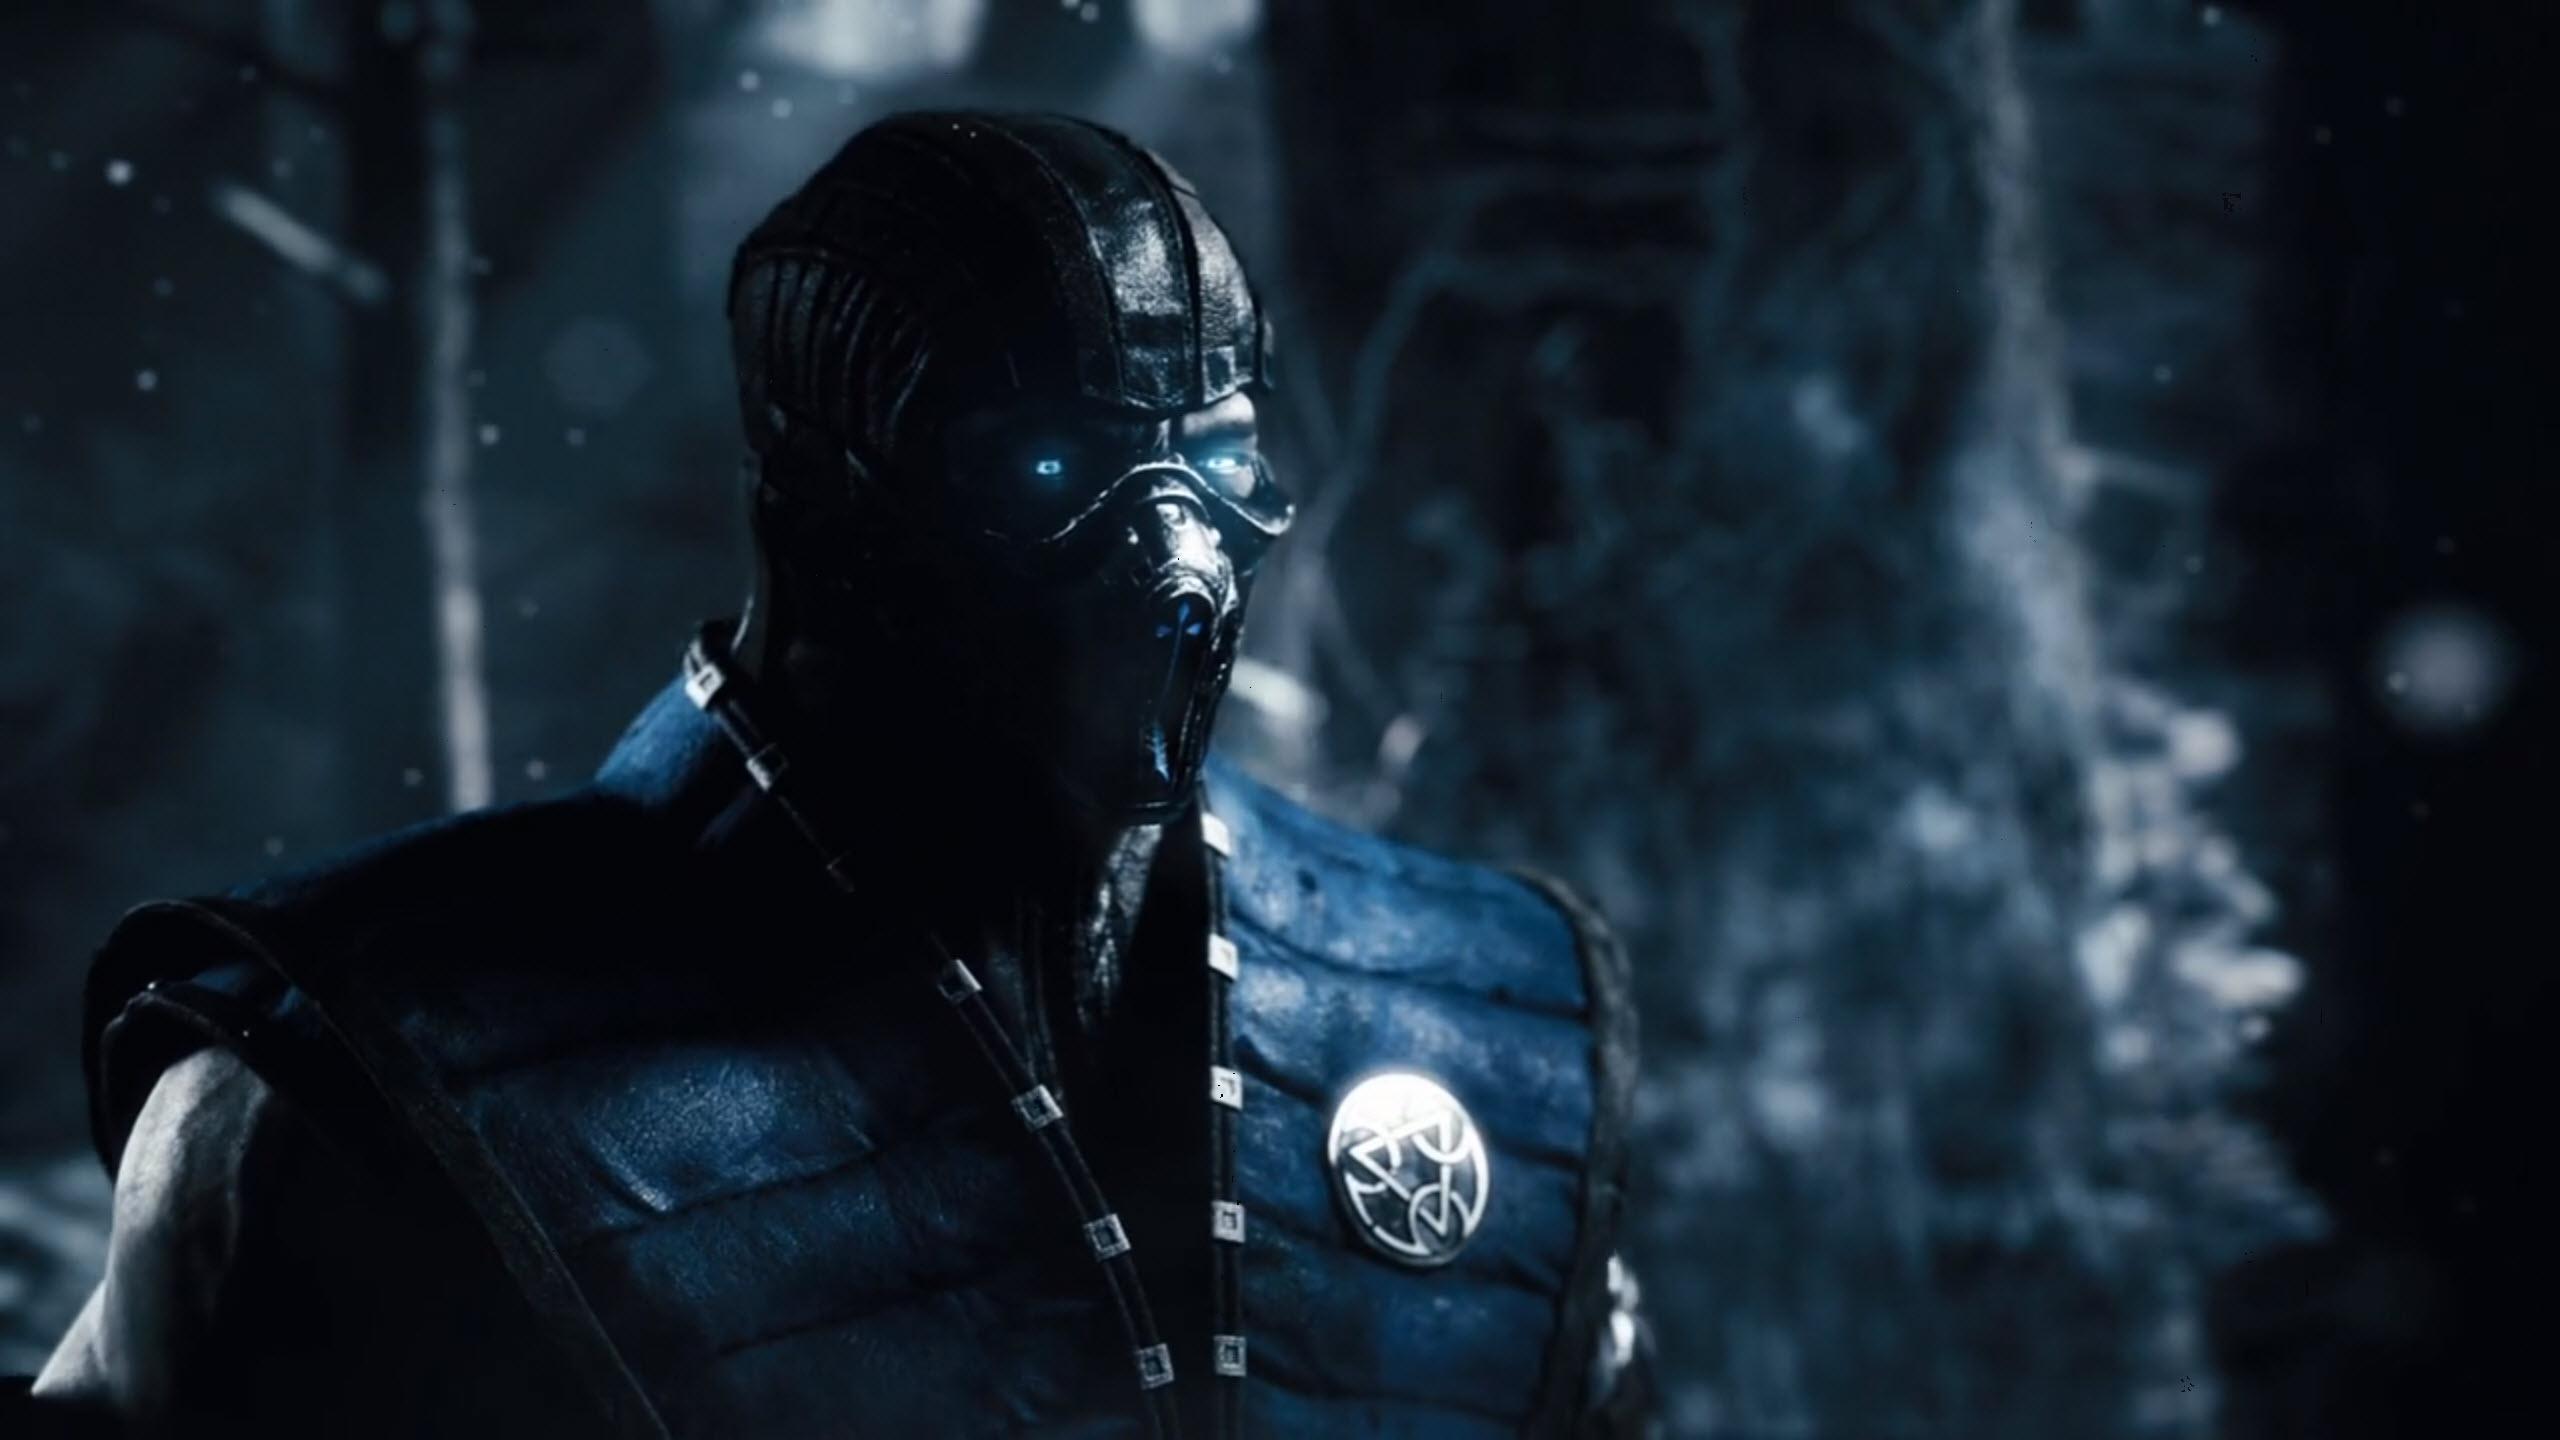 Mortal Kombat X Fatality Lives On - Features Multiplatform ... - photo#23